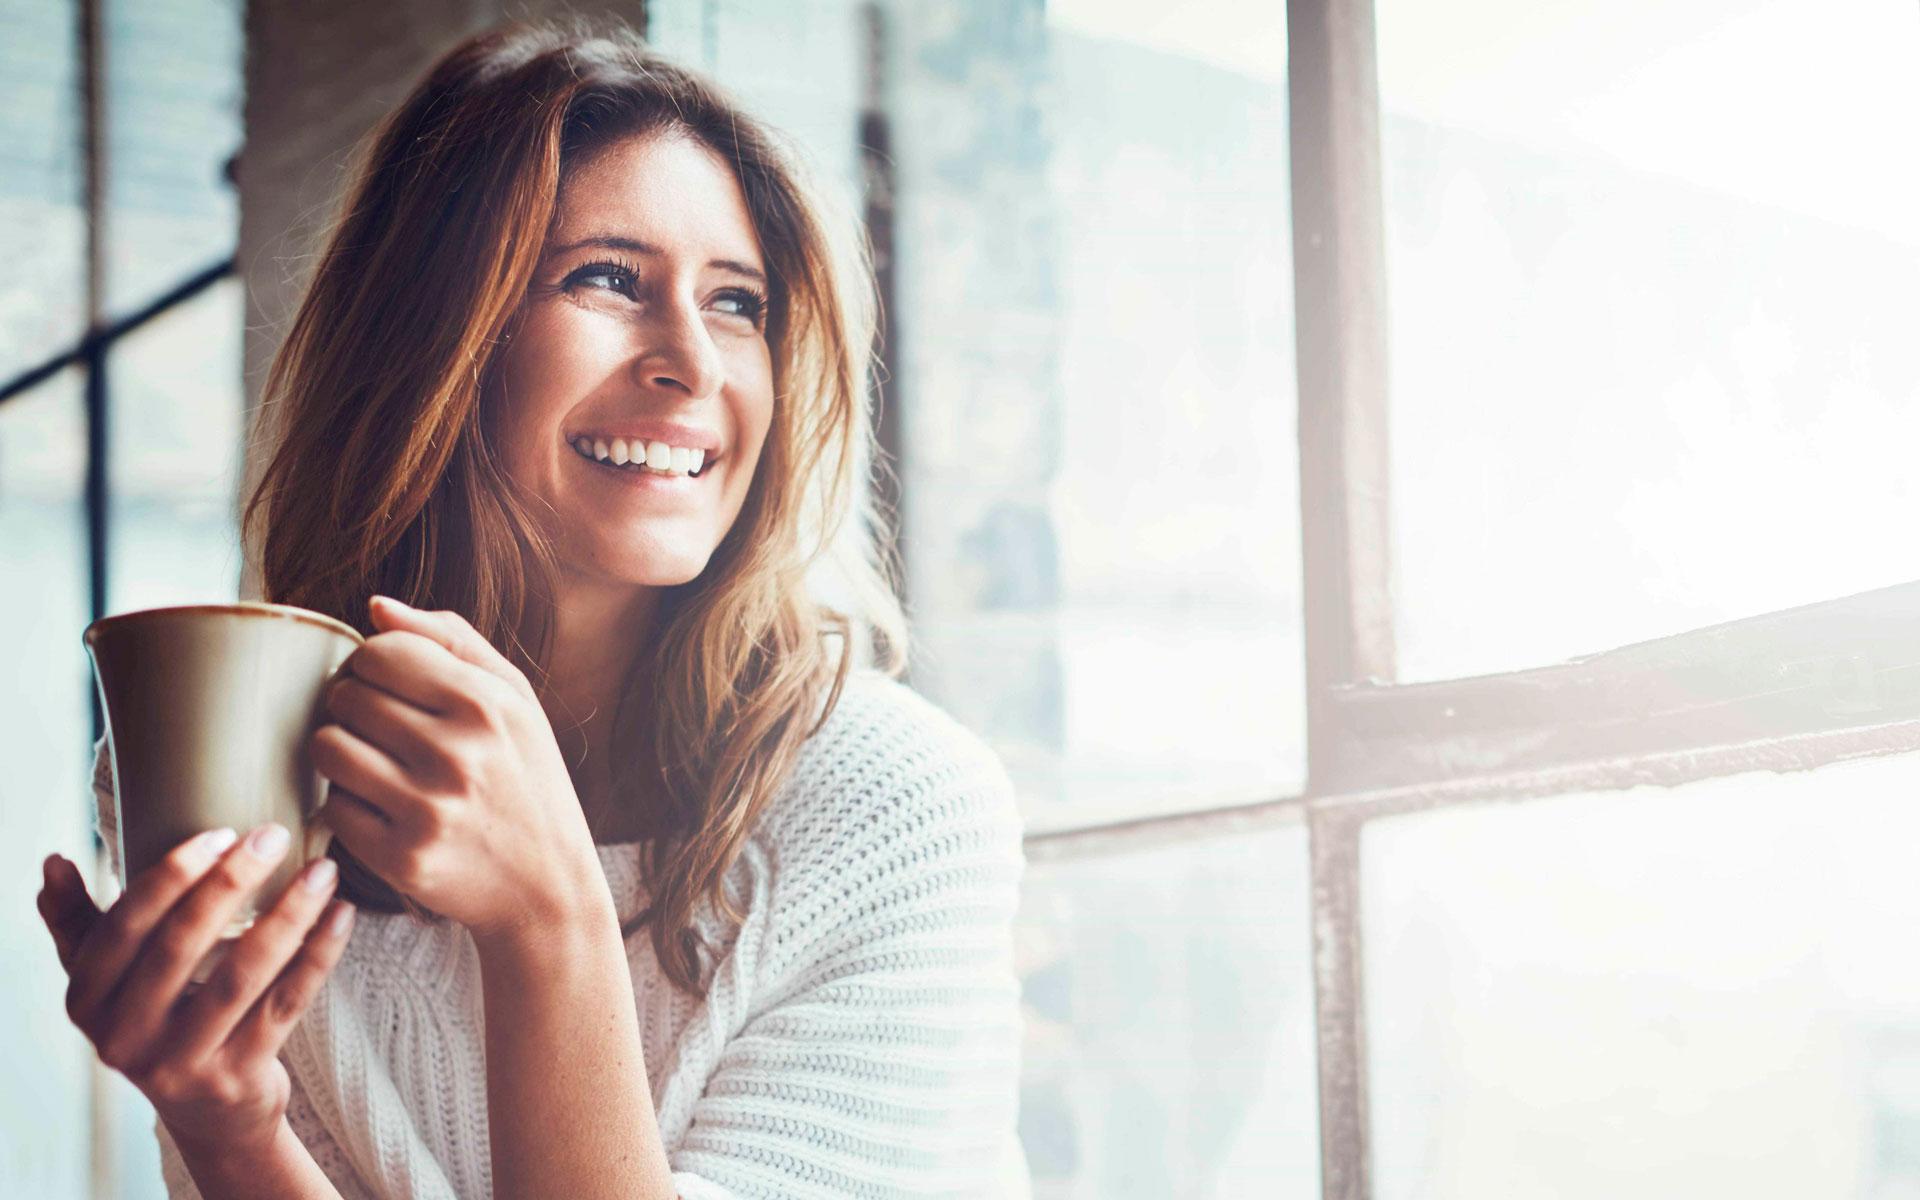 Smiling CBD woman